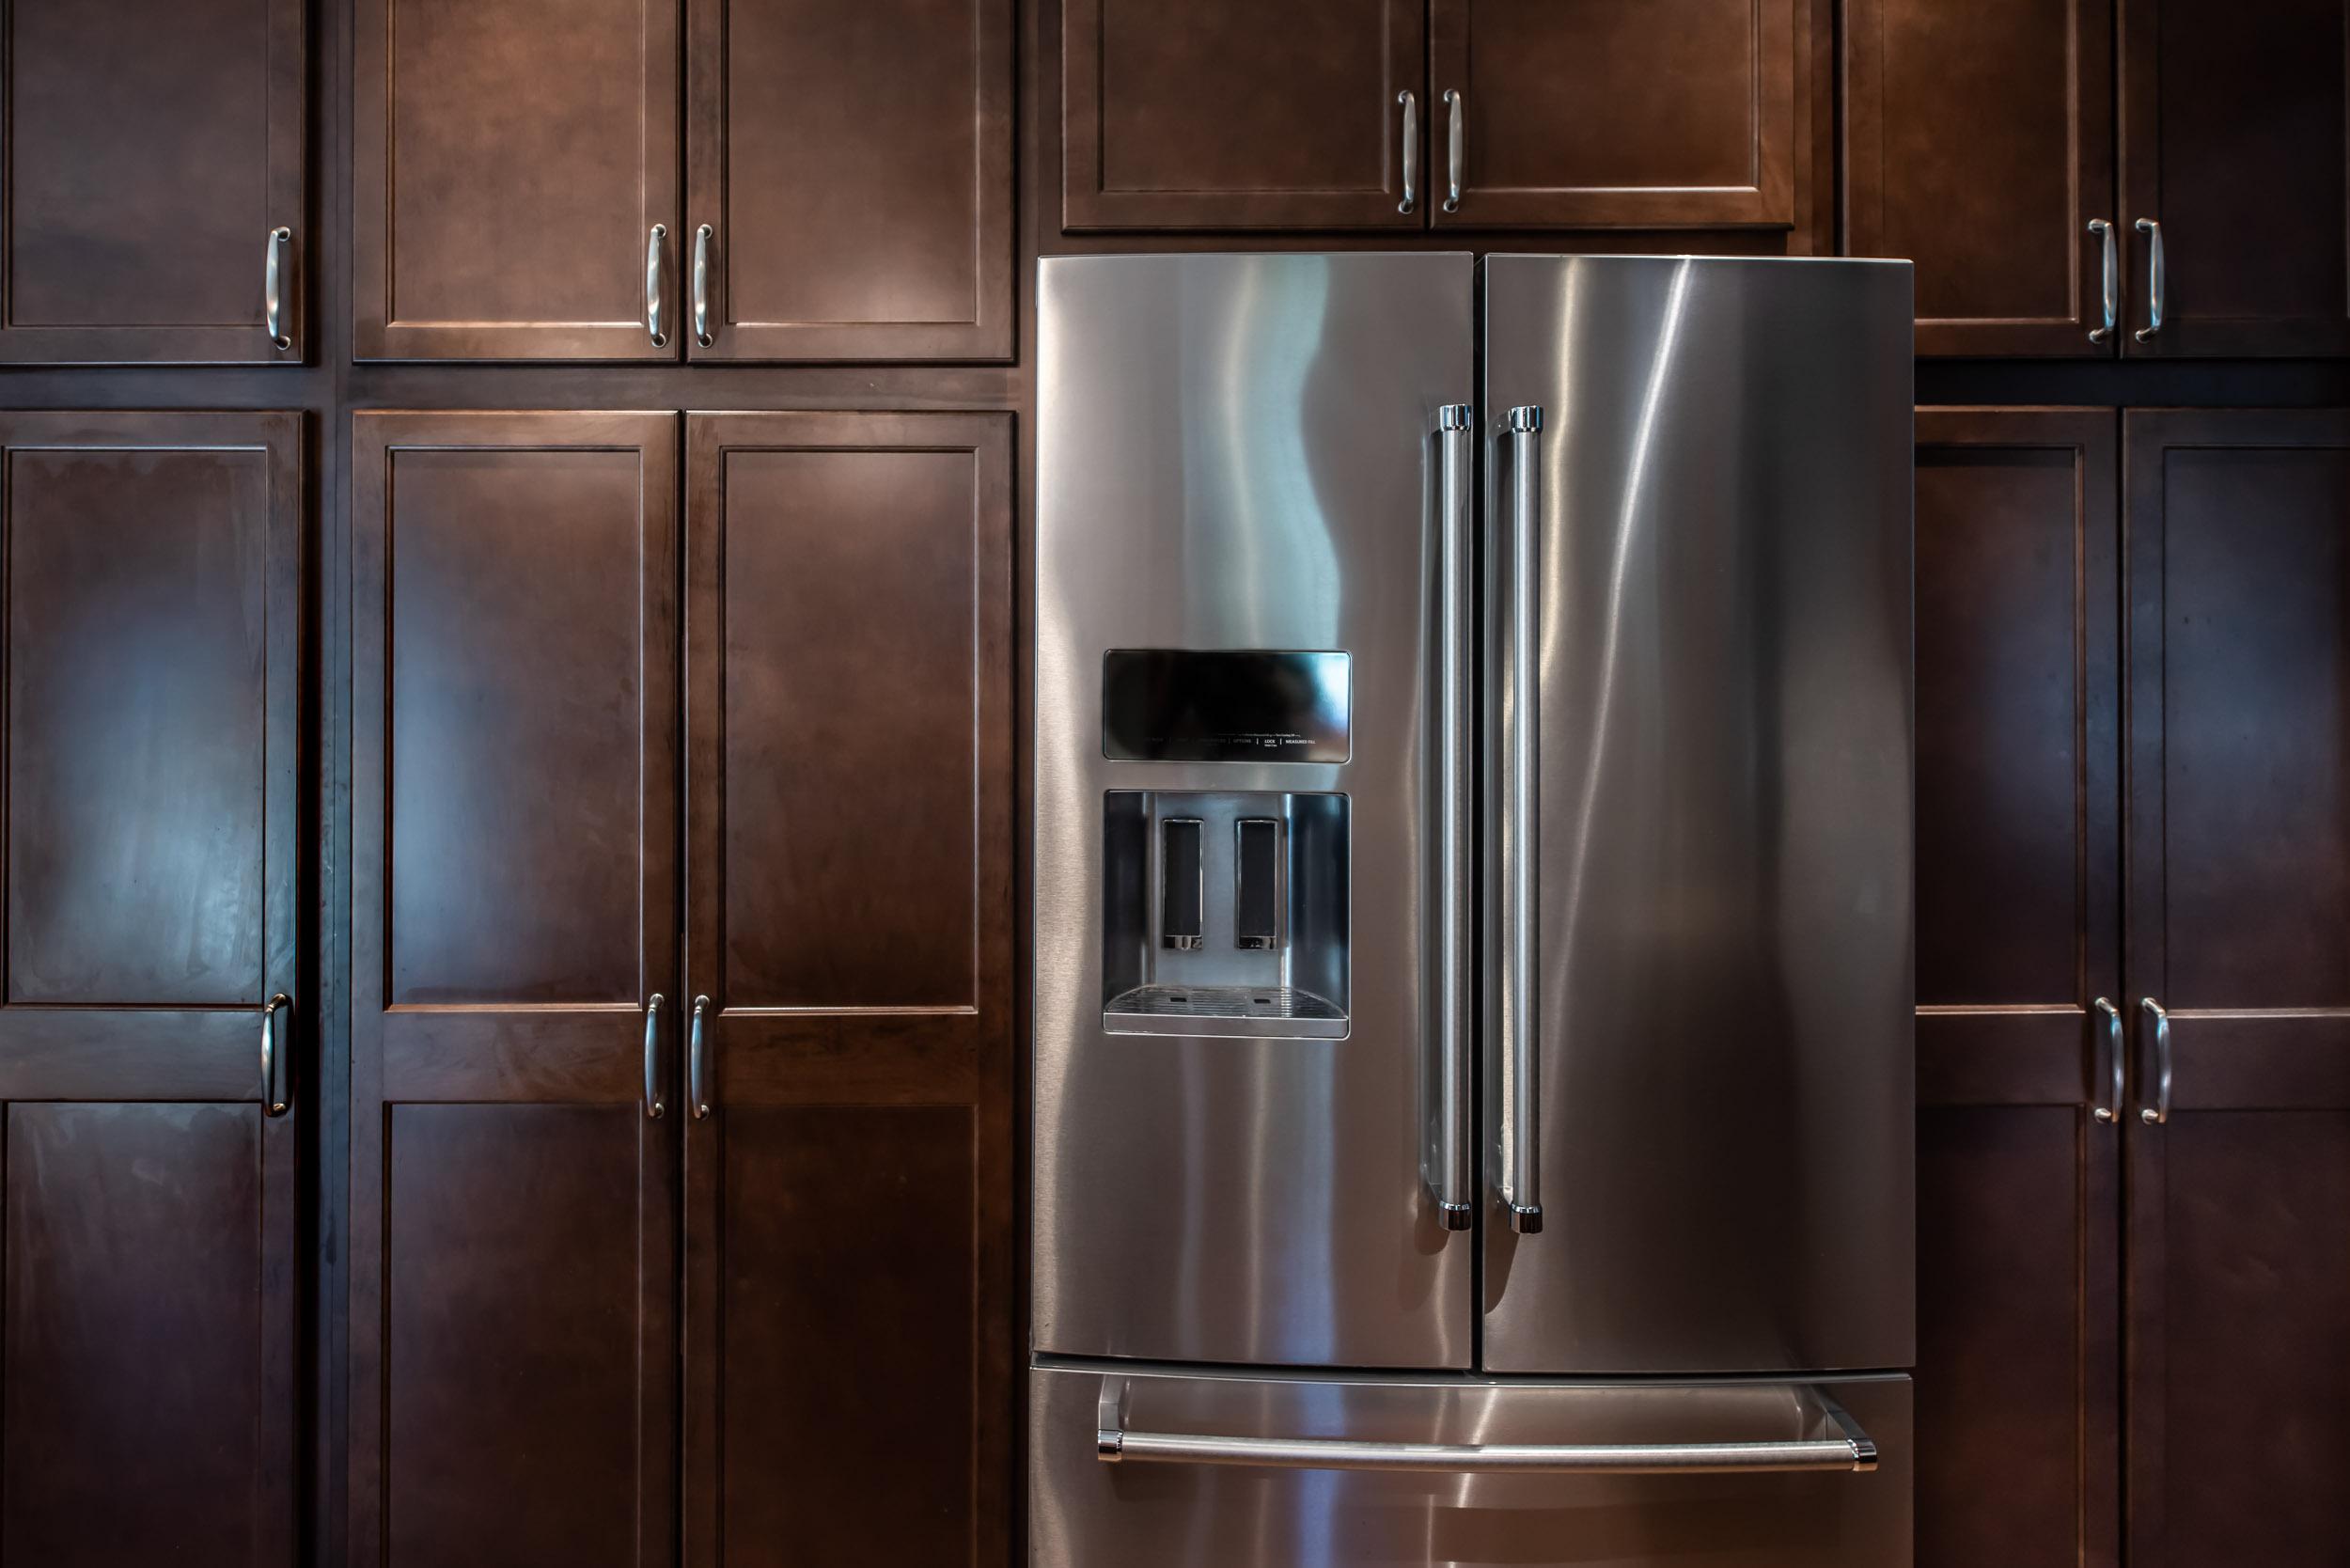 KitchenAid Appliances Were Used Throughout The Kitchen.